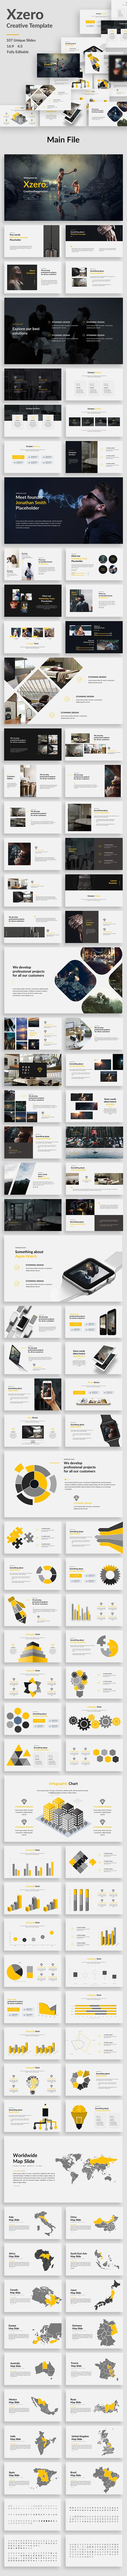 Xzero - Creative Powerpoint Template - Creative PowerPoint Templates